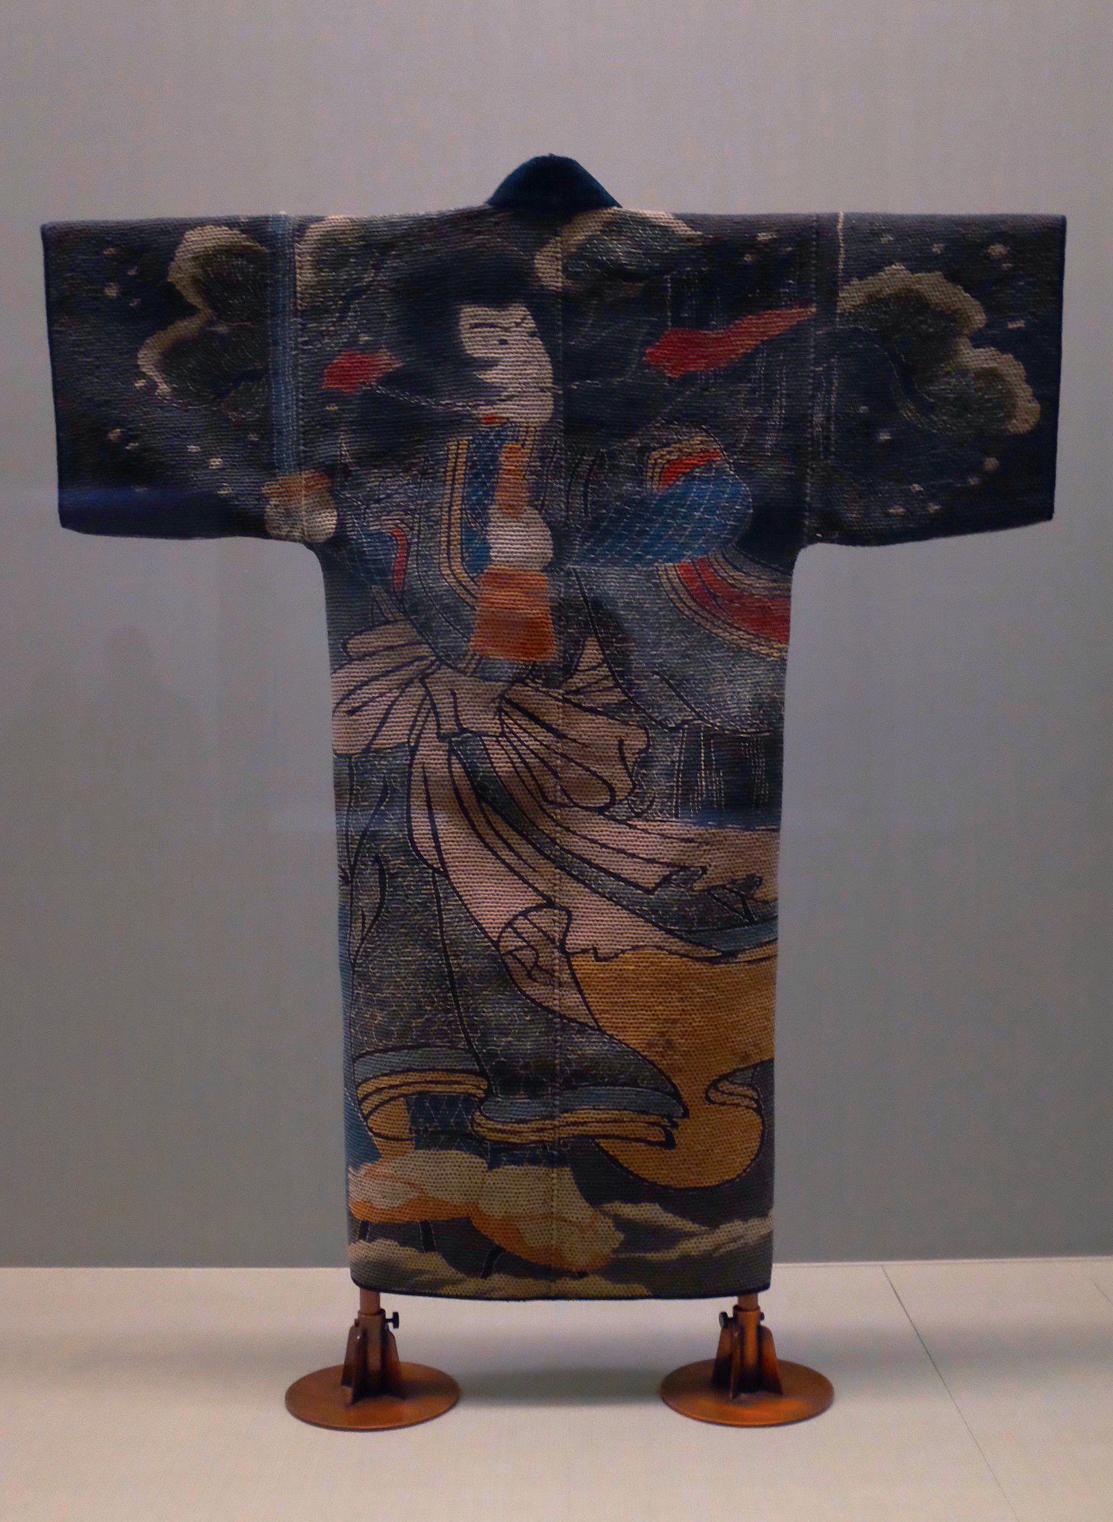 faye_mcnulty_fireman_kimono_tokyo_national_museum